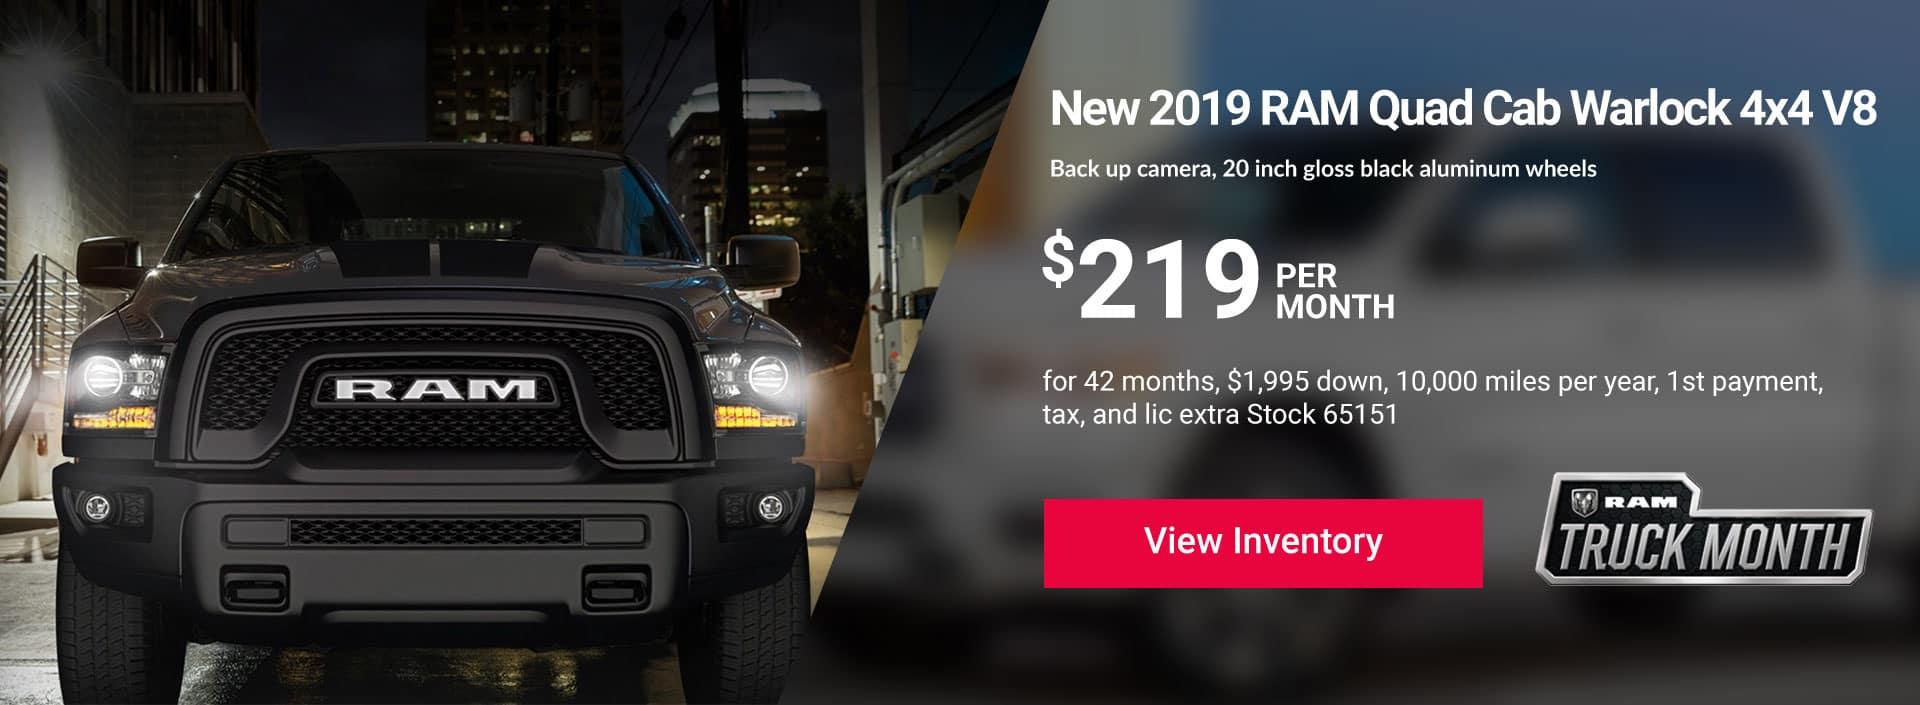 2019 RAM Quad Cab Warlock